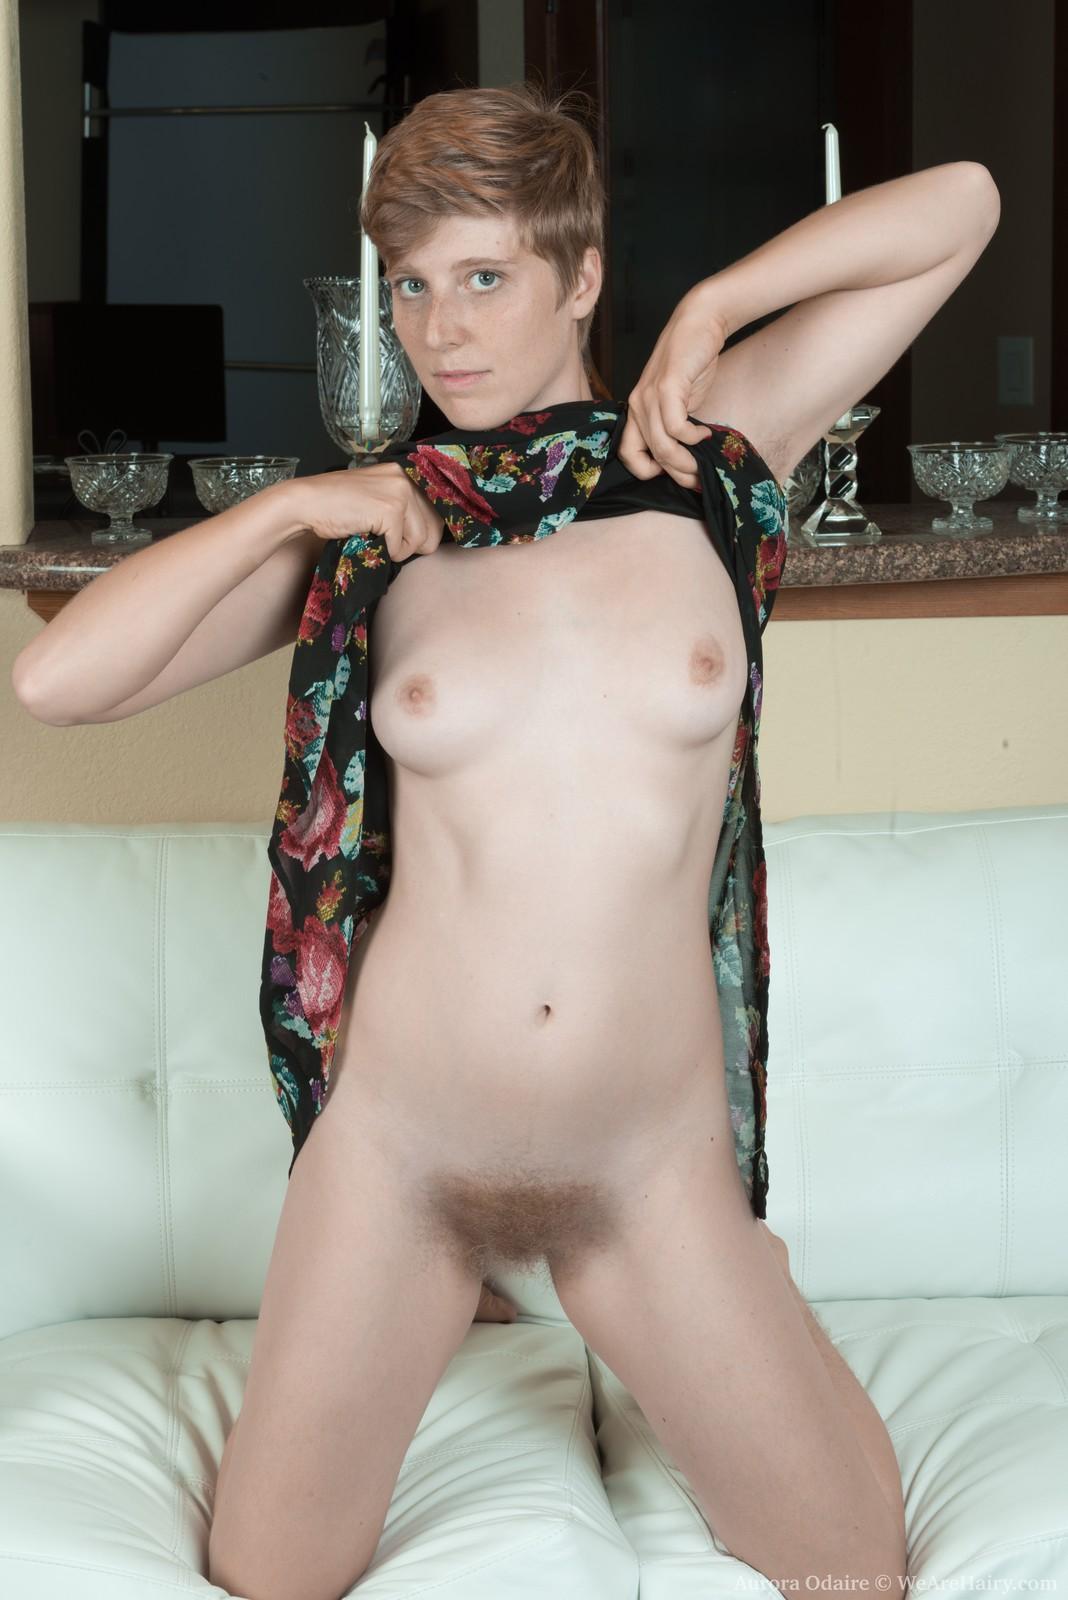 hot naked girls using urinals